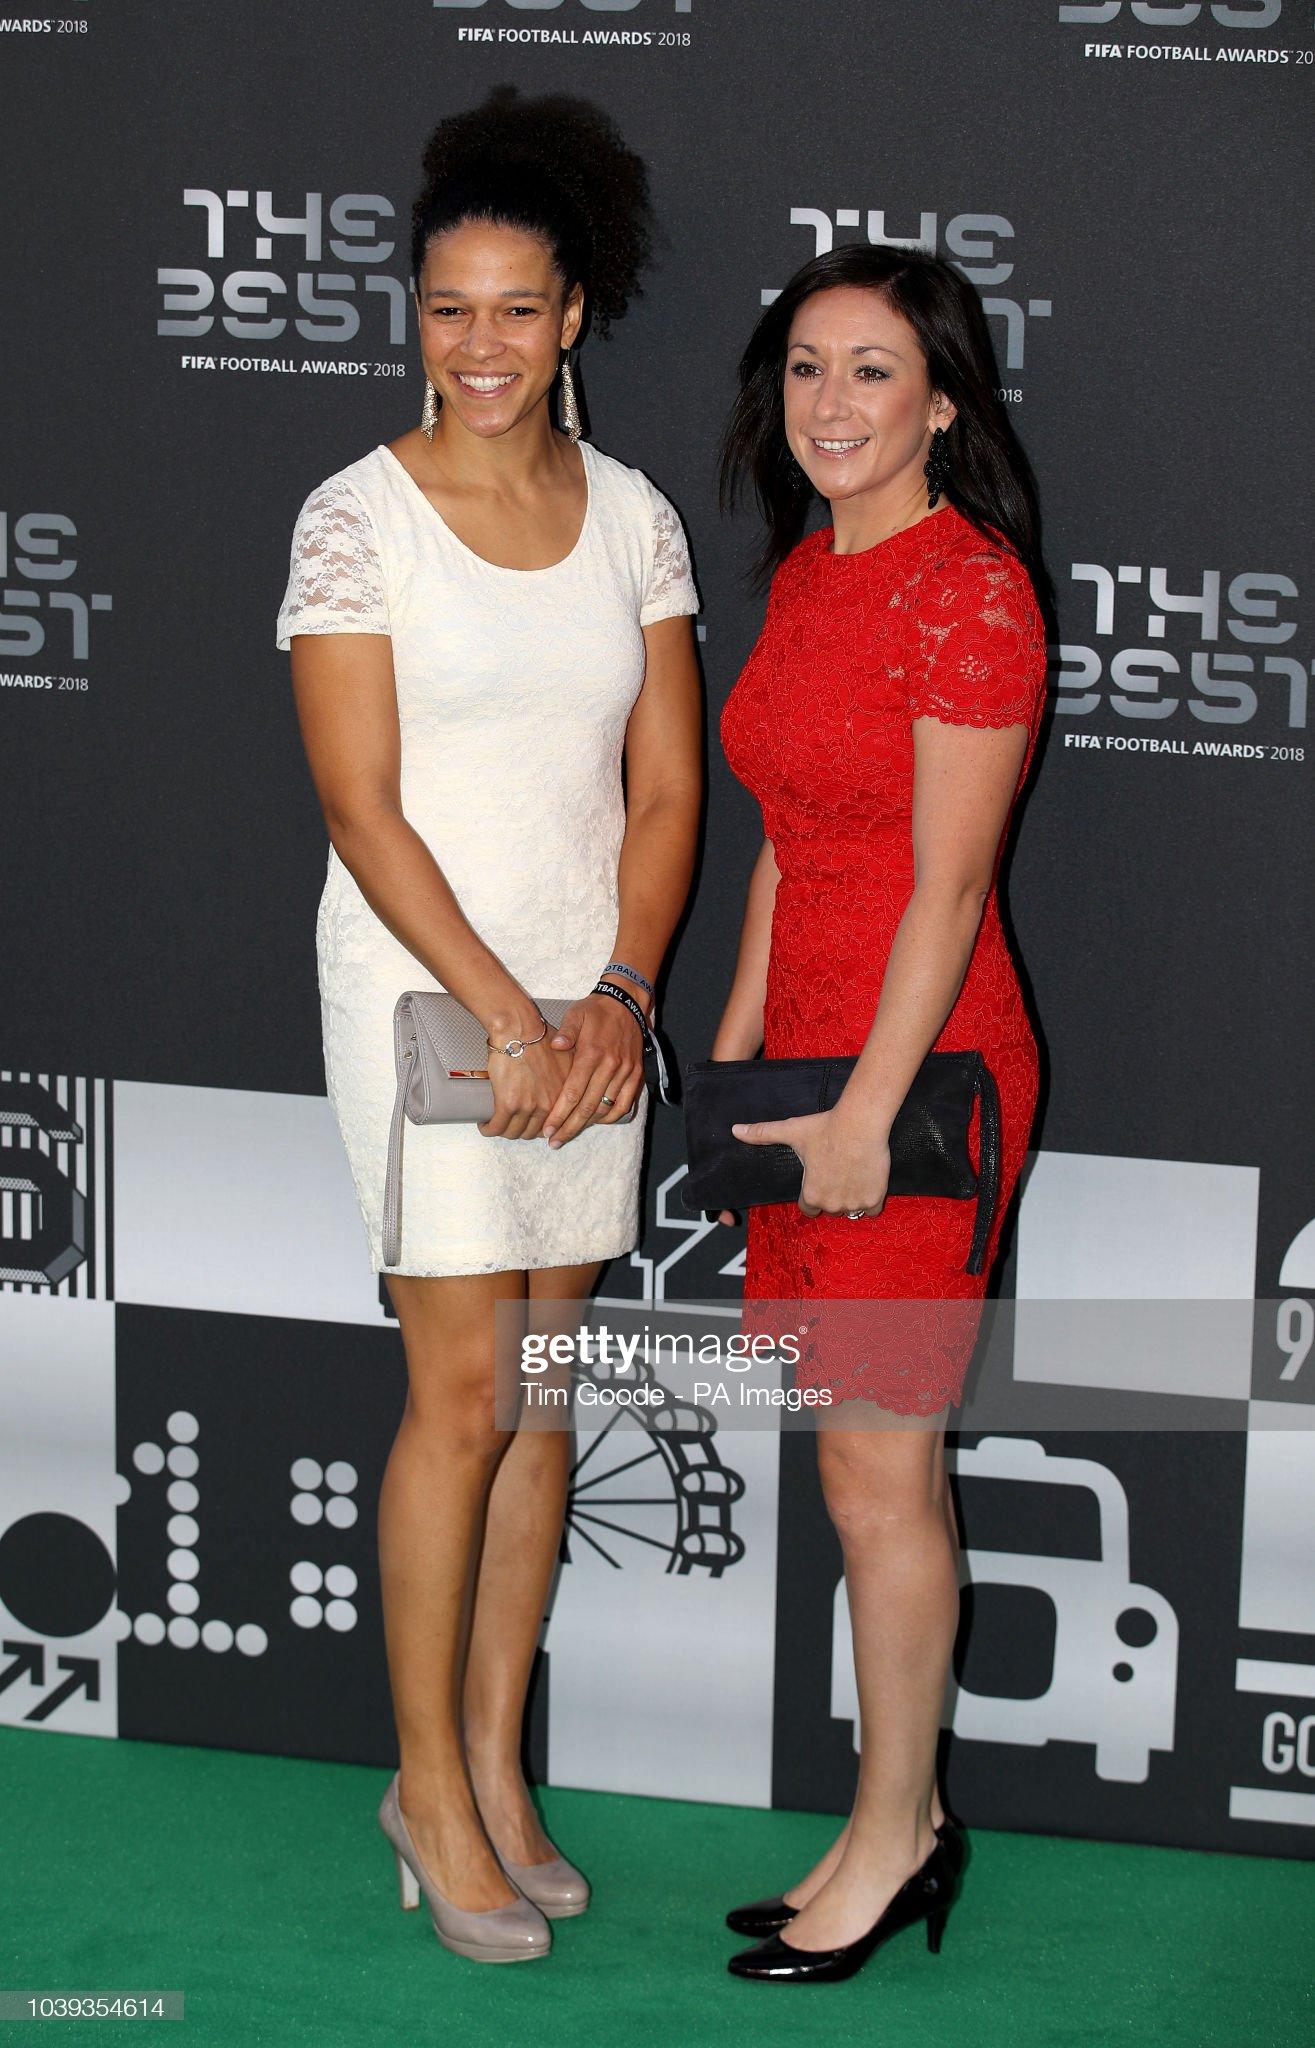 ¿Cuánto mide Celia Sasic? - Altura - Real height Nadine-kessler-and-celia-sasic-during-the-best-fifa-football-awards-picture-id1039354614?s=2048x2048